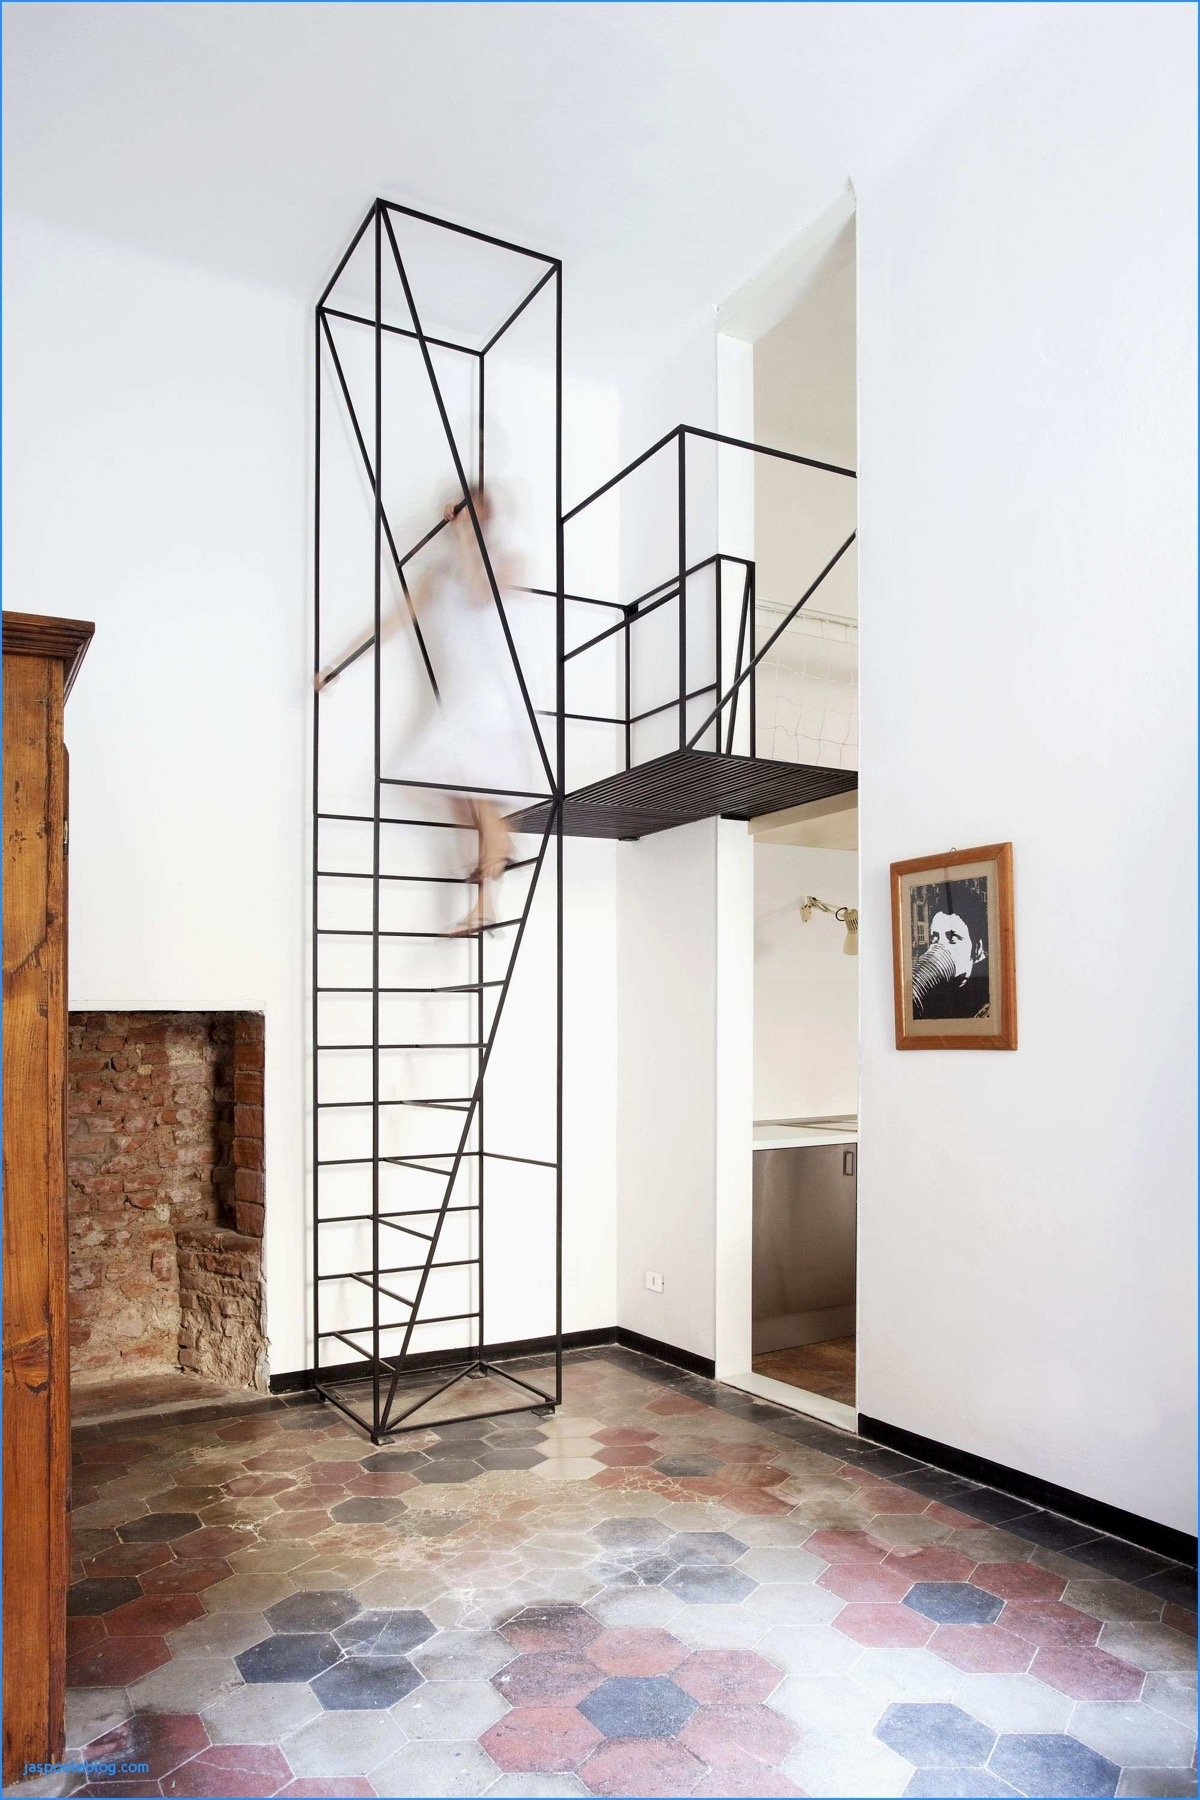 51 Stunning Staircase Design Ideas | Home Outside Steps Design | Handrail | Building | Ground Floor | Outer | 1St Floor